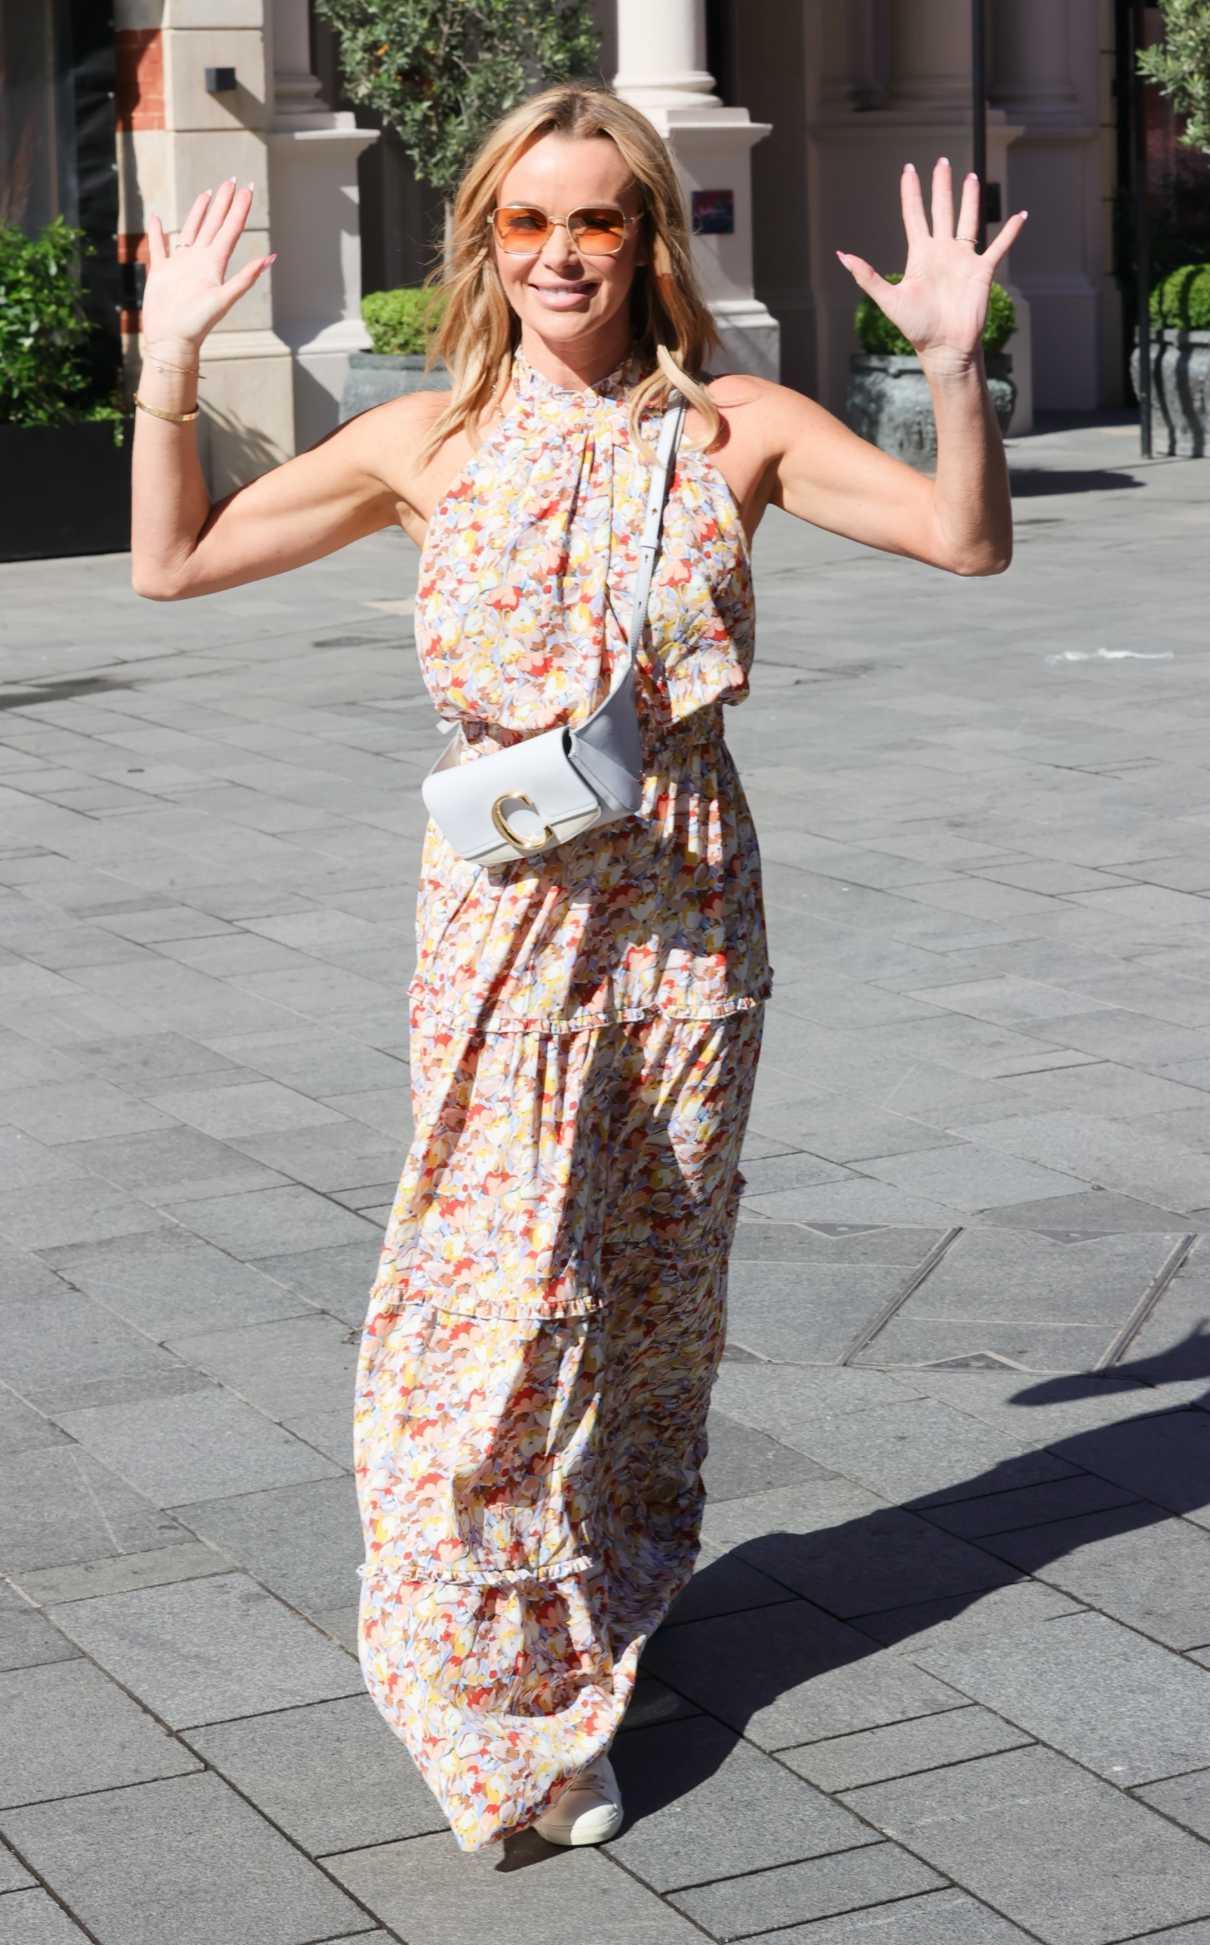 Amanda Holden in a Floral Maxi Dress